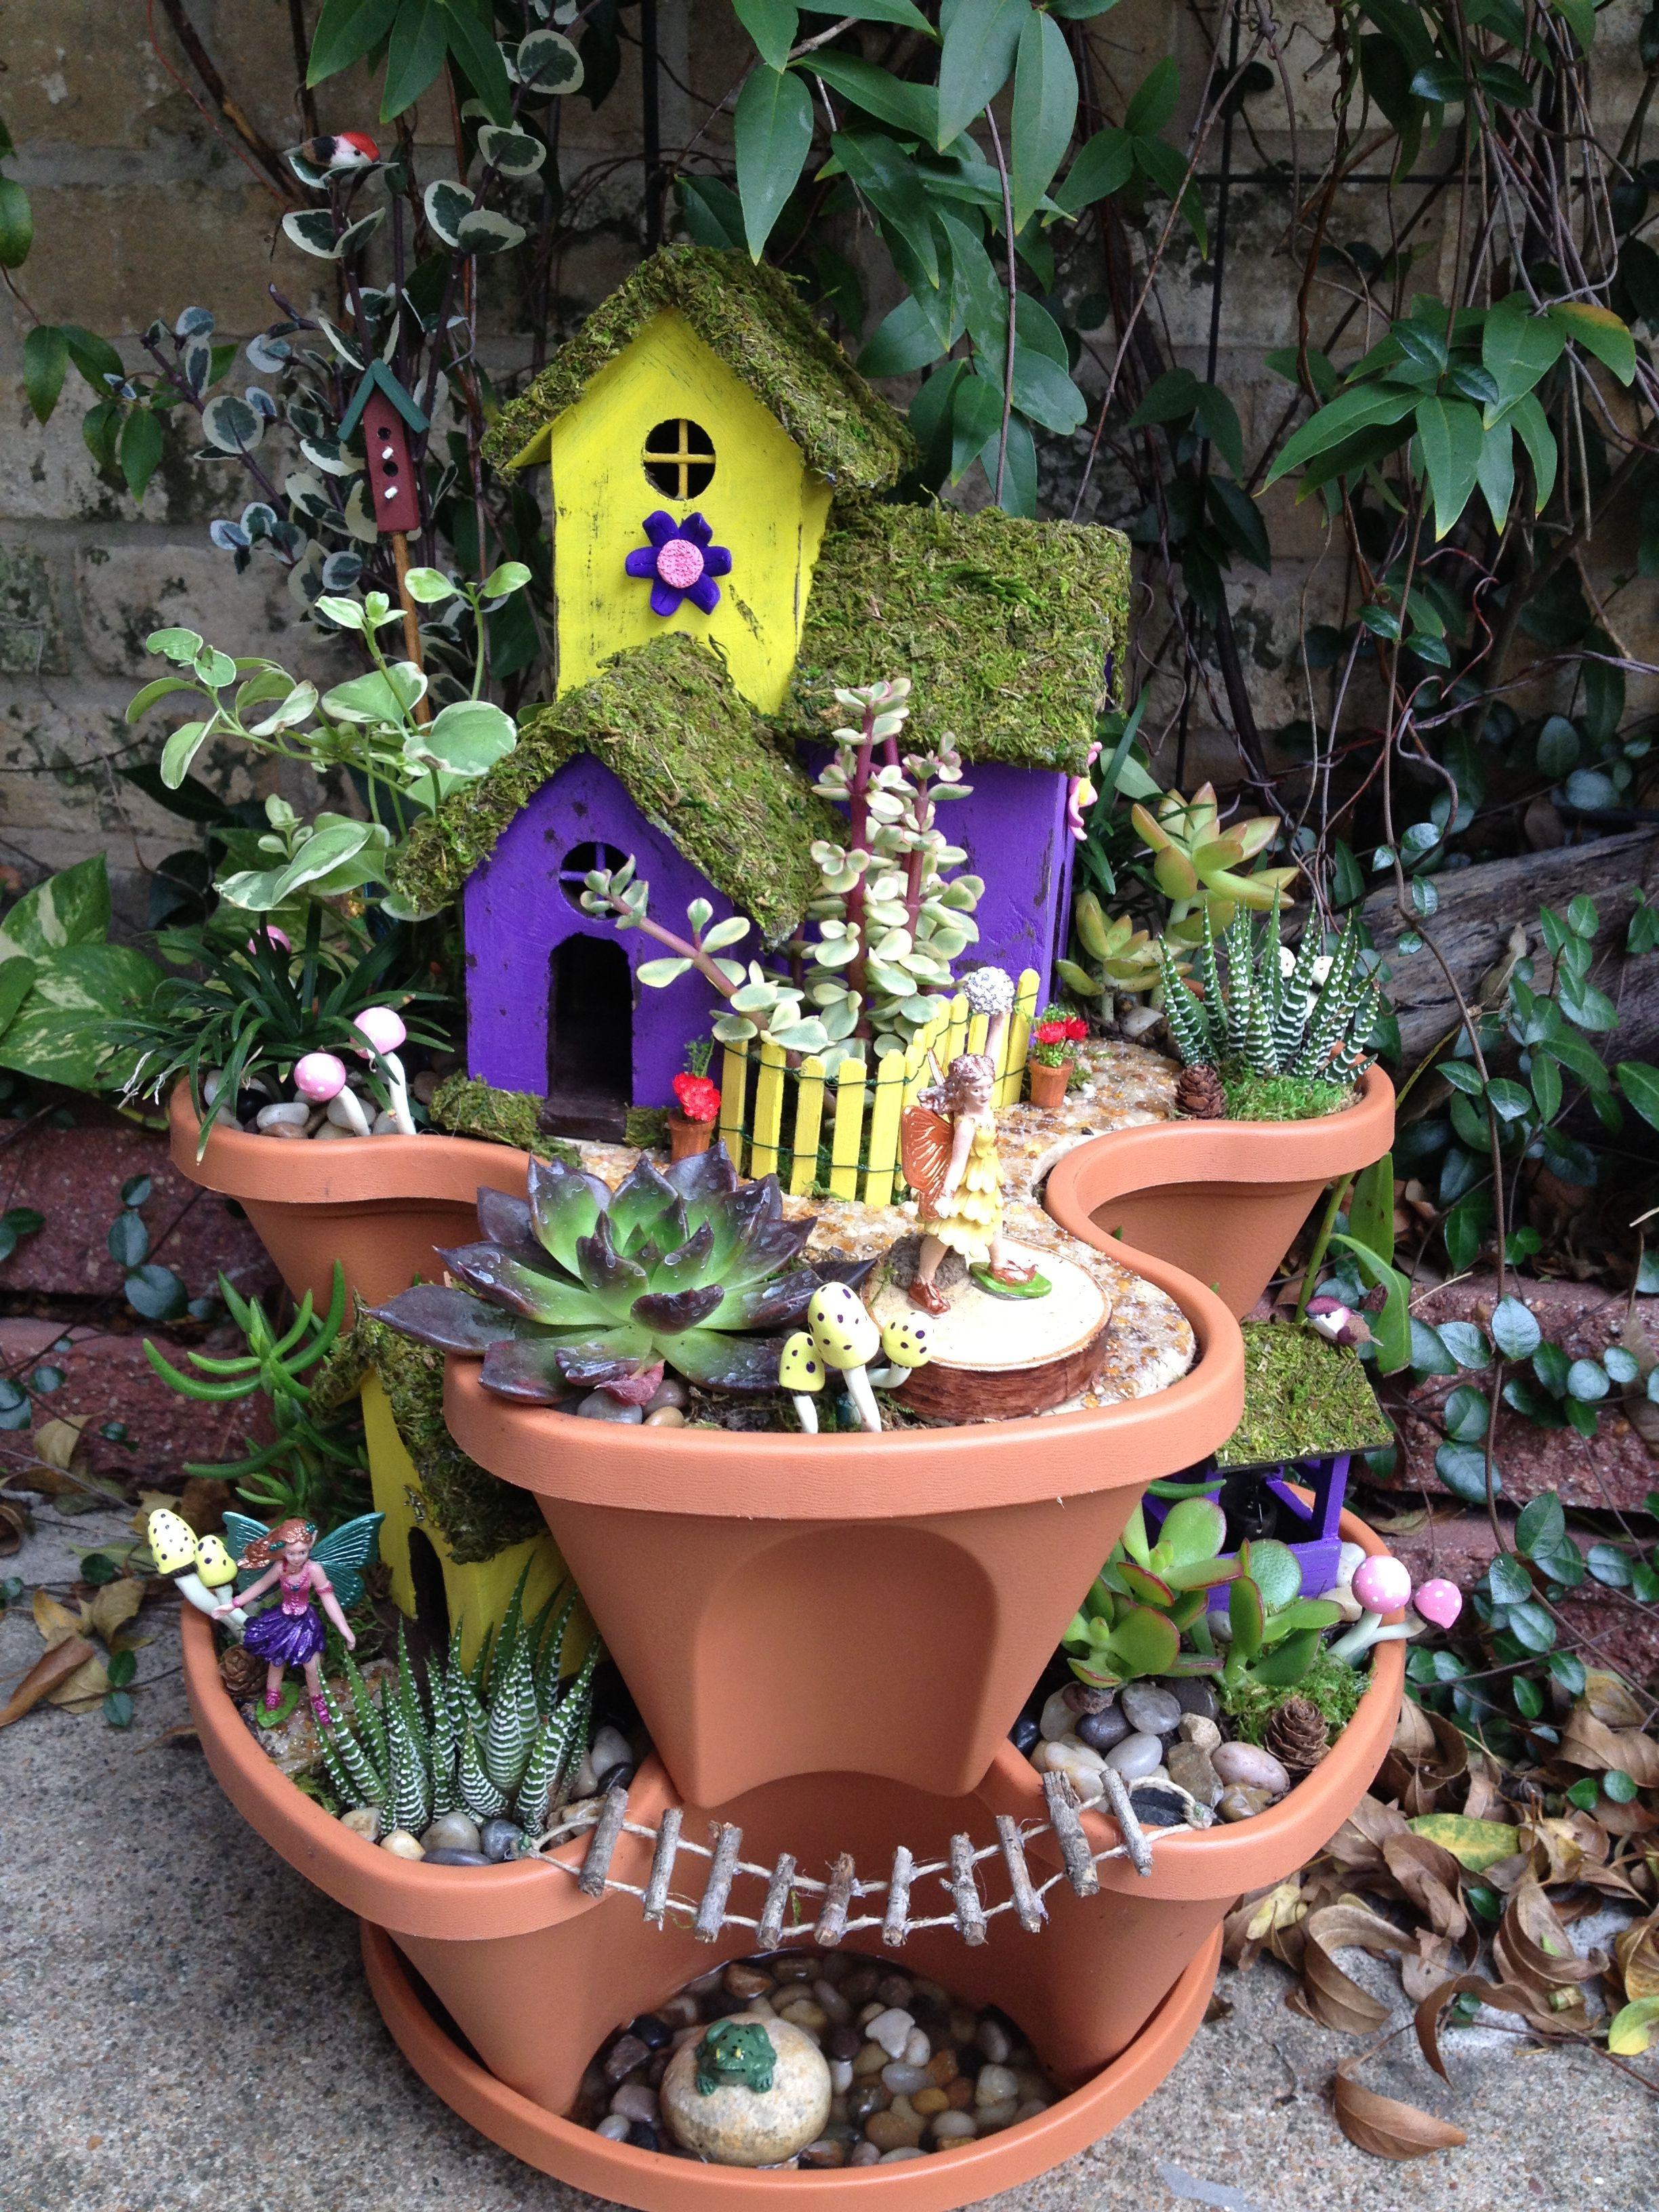 Miniature fairy garden sabrina front all real plants - Miniature plants for fairy gardens ...